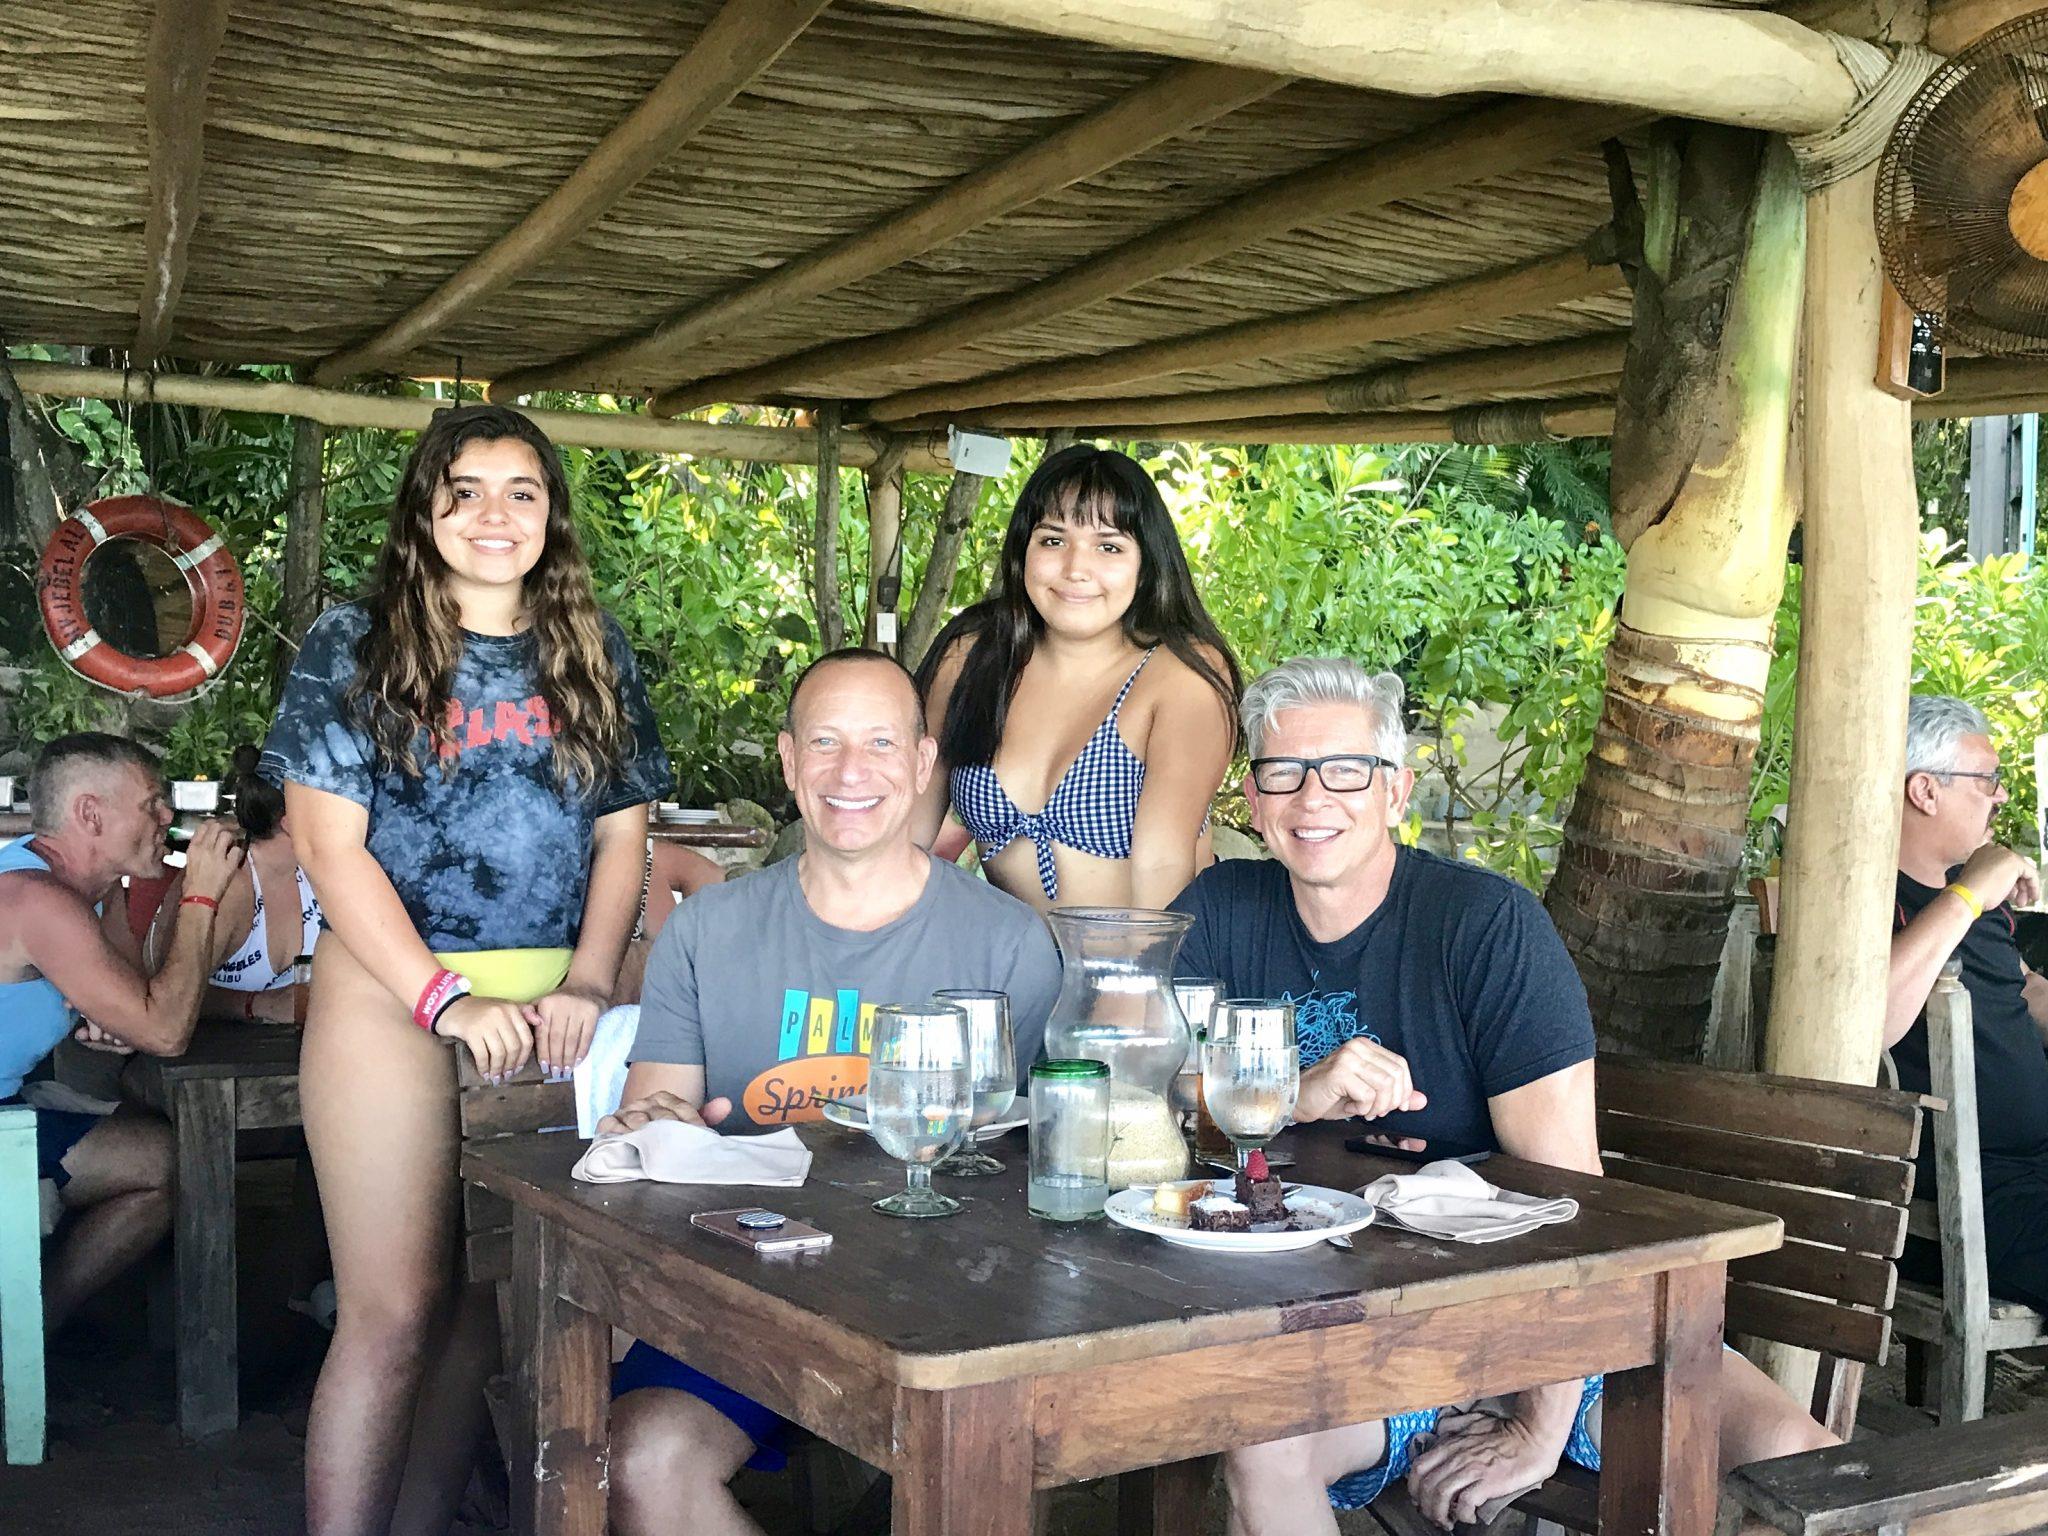 Puerto Vallarta Won Our Family's Hearts